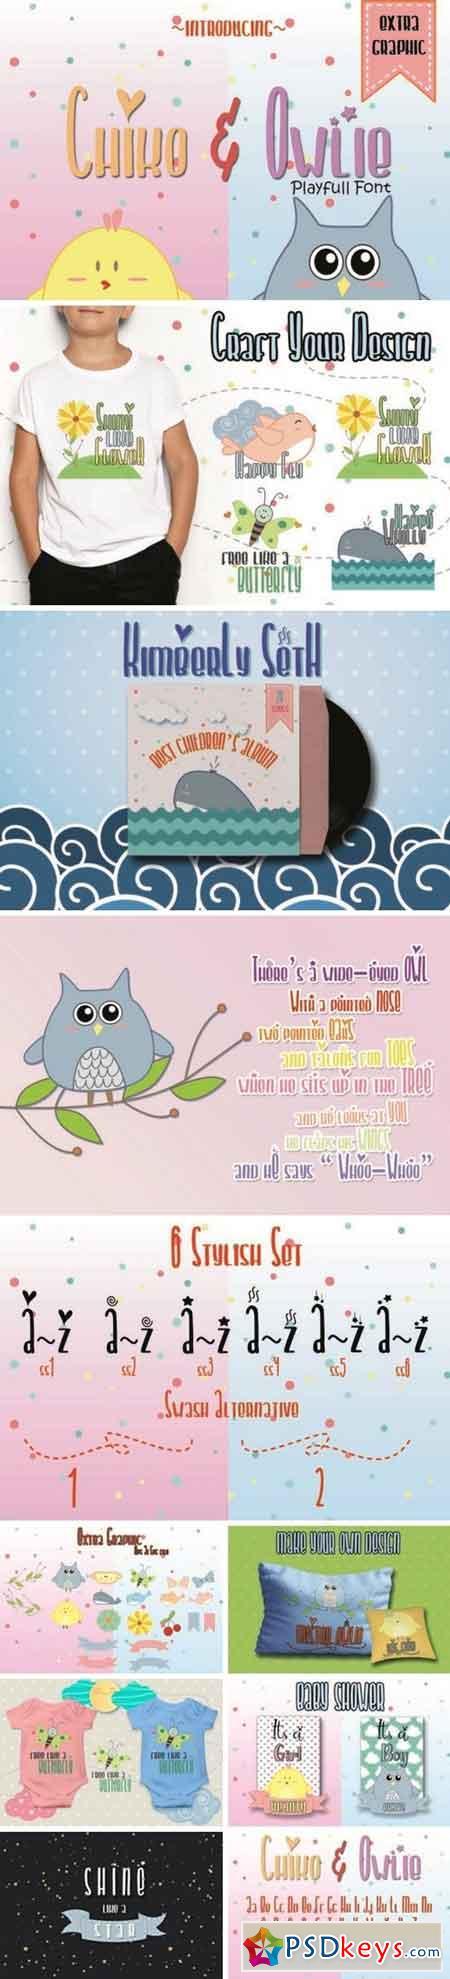 Chiko & Owlie - Extra Cute Graphic 132973